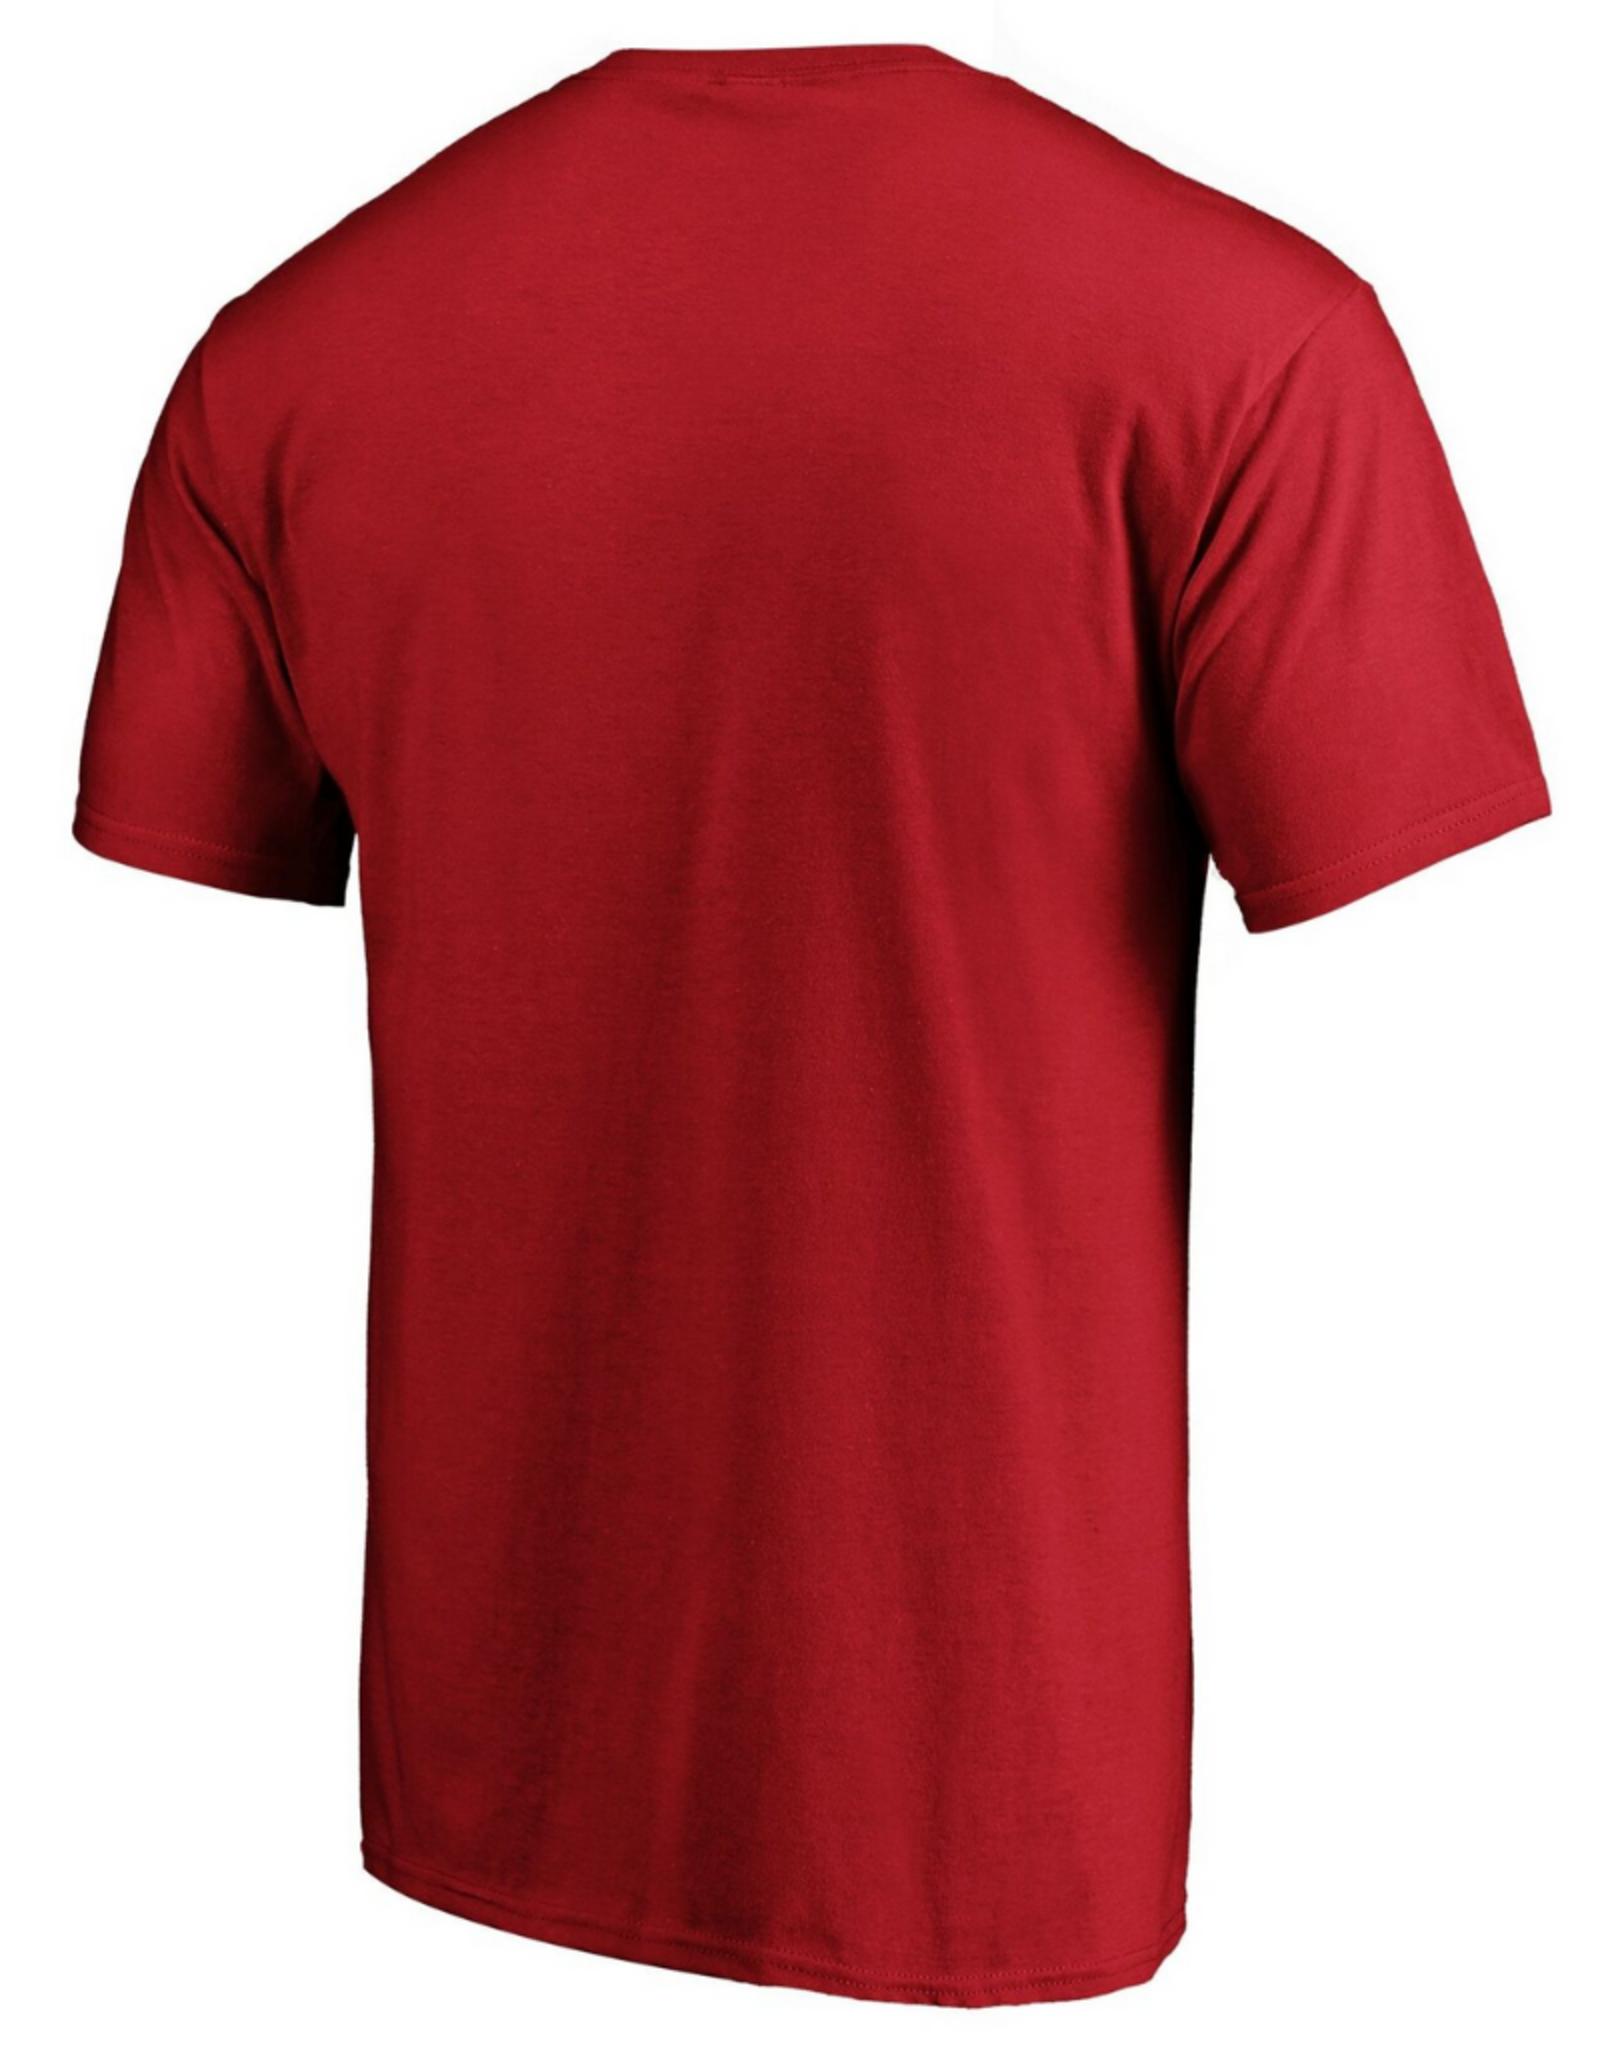 Fanatics Fanatics Men's Authentic Pro Rinkside Prime Detroit Red Wings T-Shirt Red